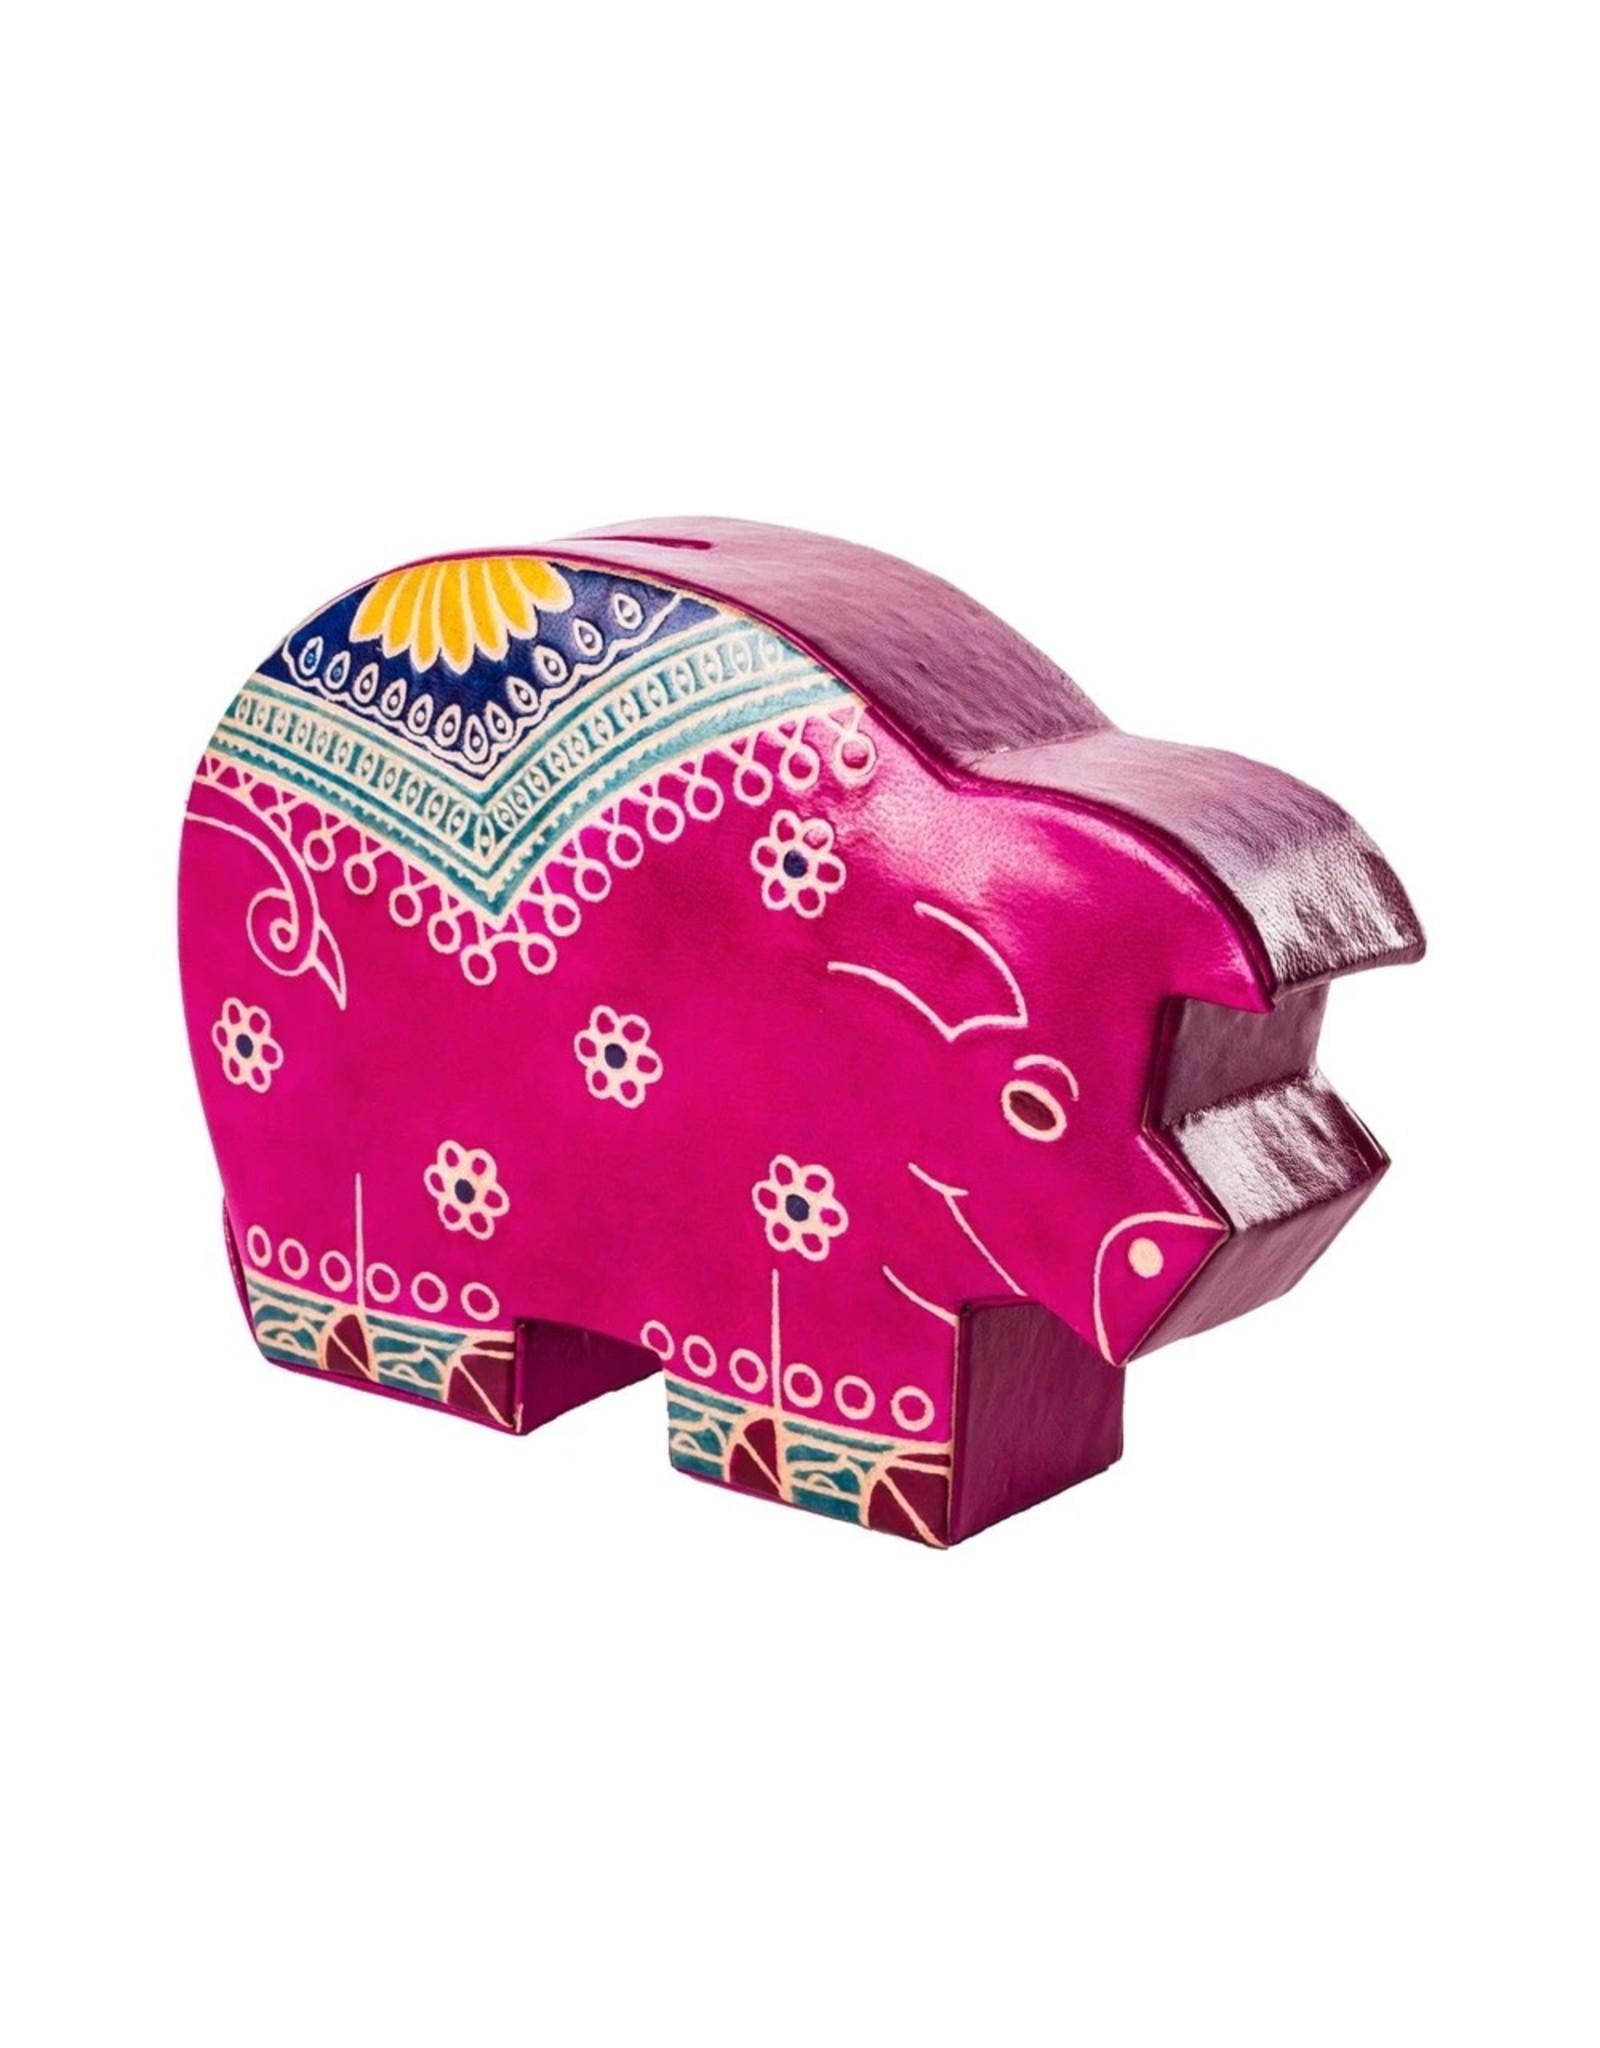 Matr Boomie Leather Piggy Bank, India